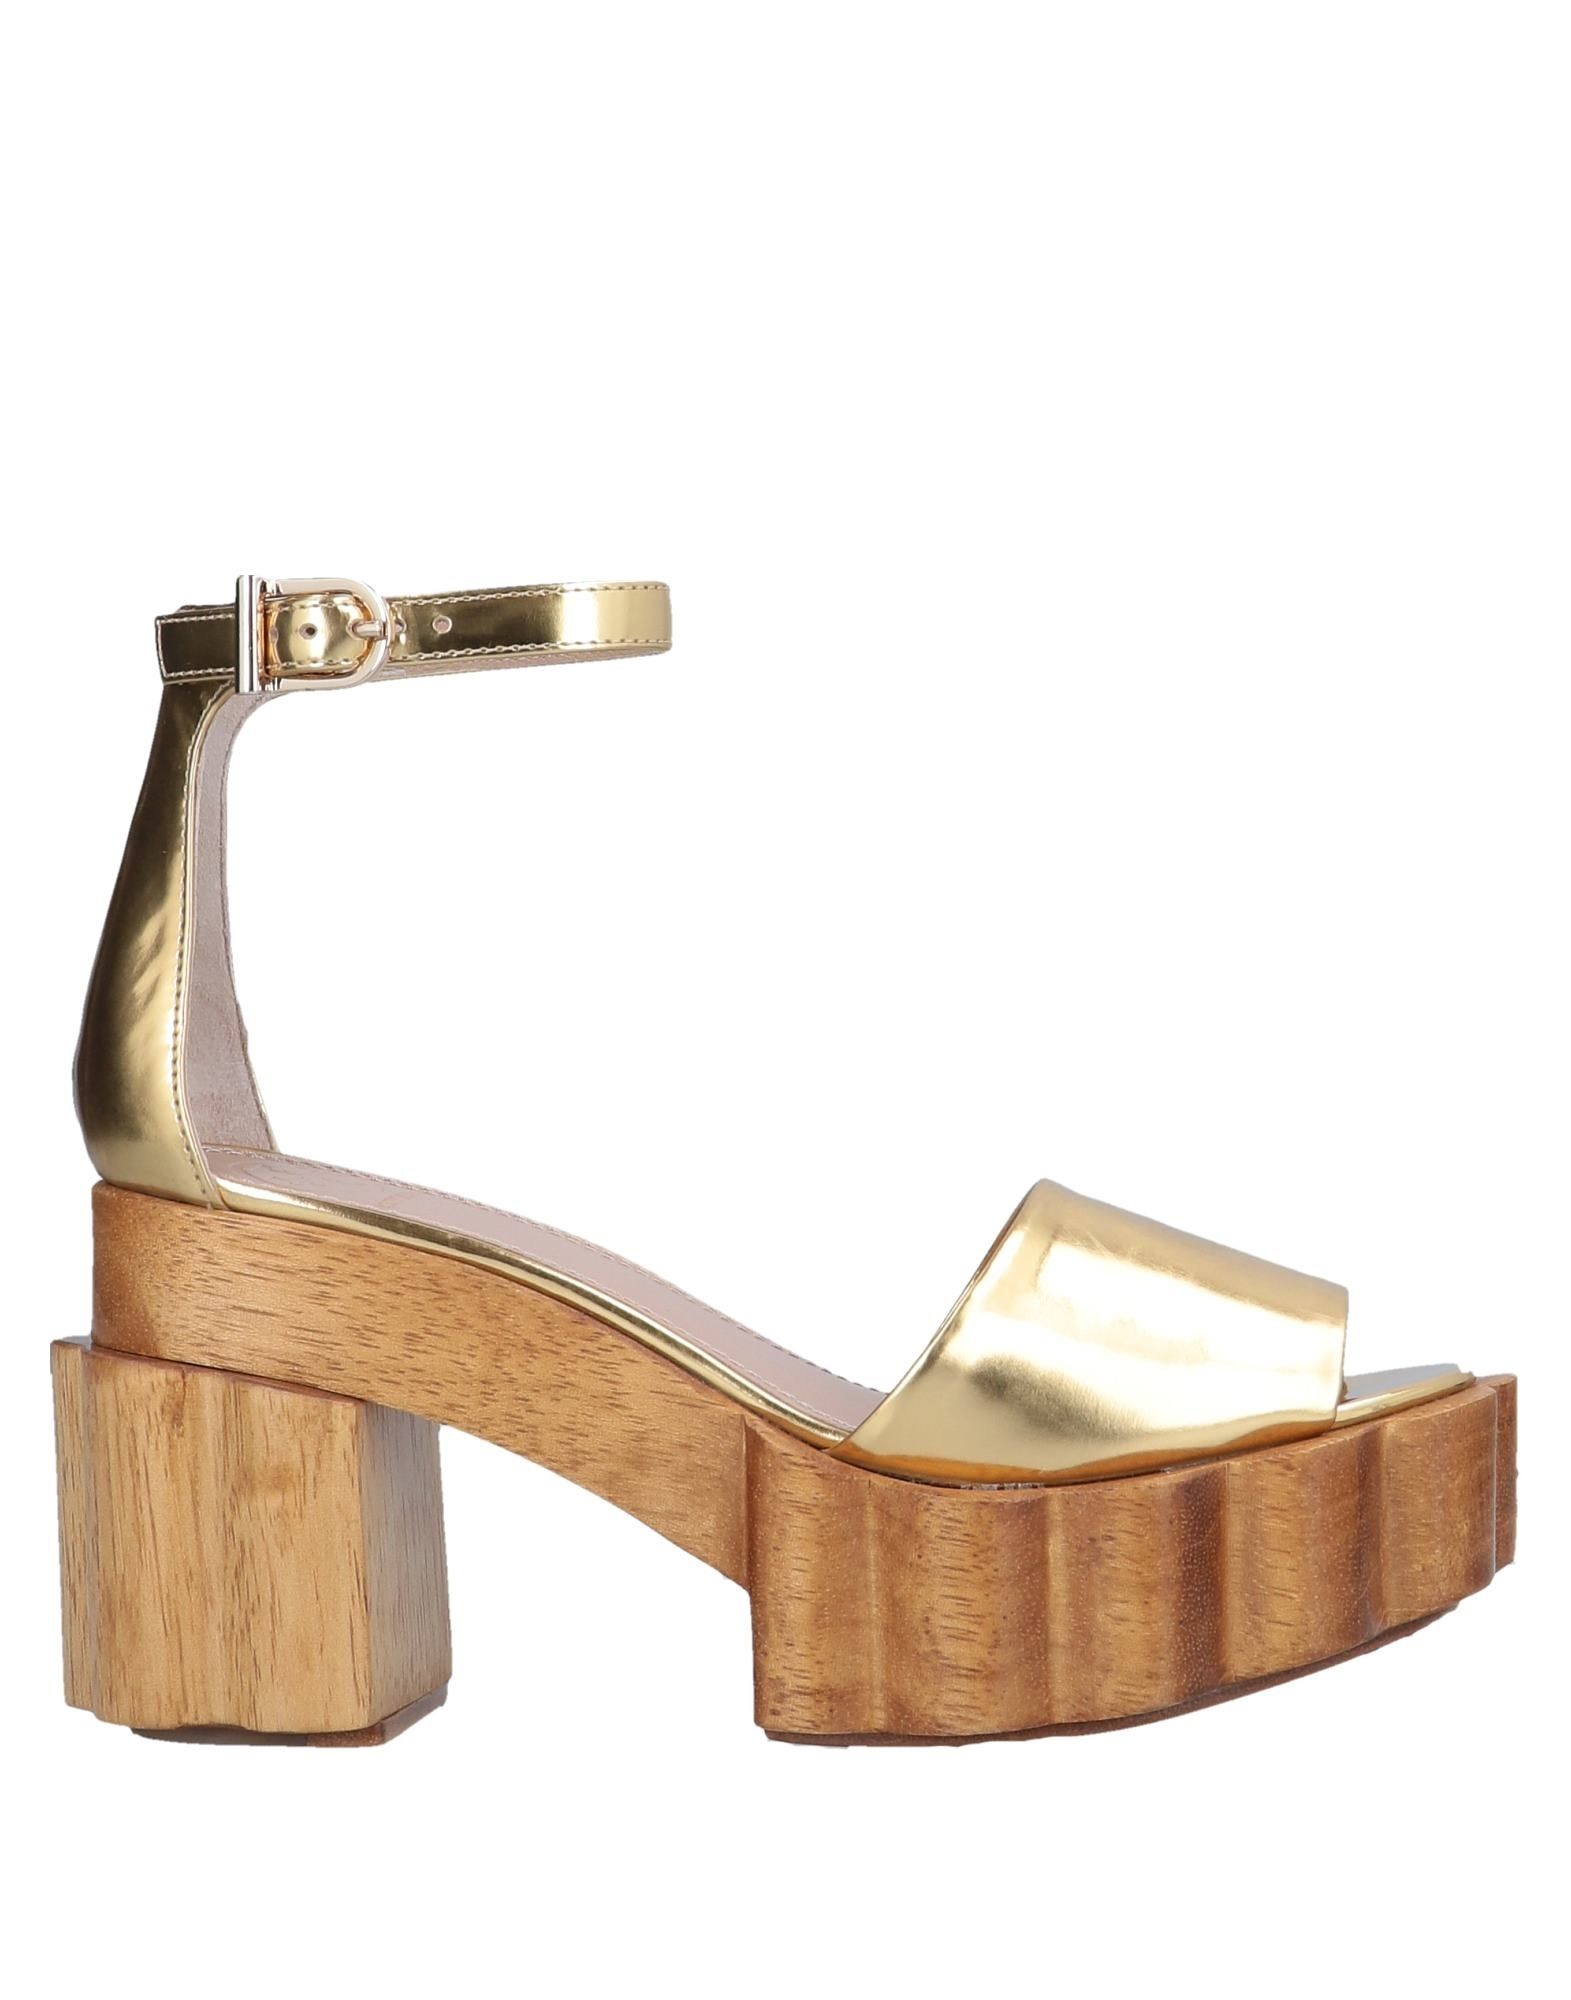 Tory Burch Sandals Sandals - Women Tory Burch Sandals Sandals online on  Canada - 11576206XW b6e4b1